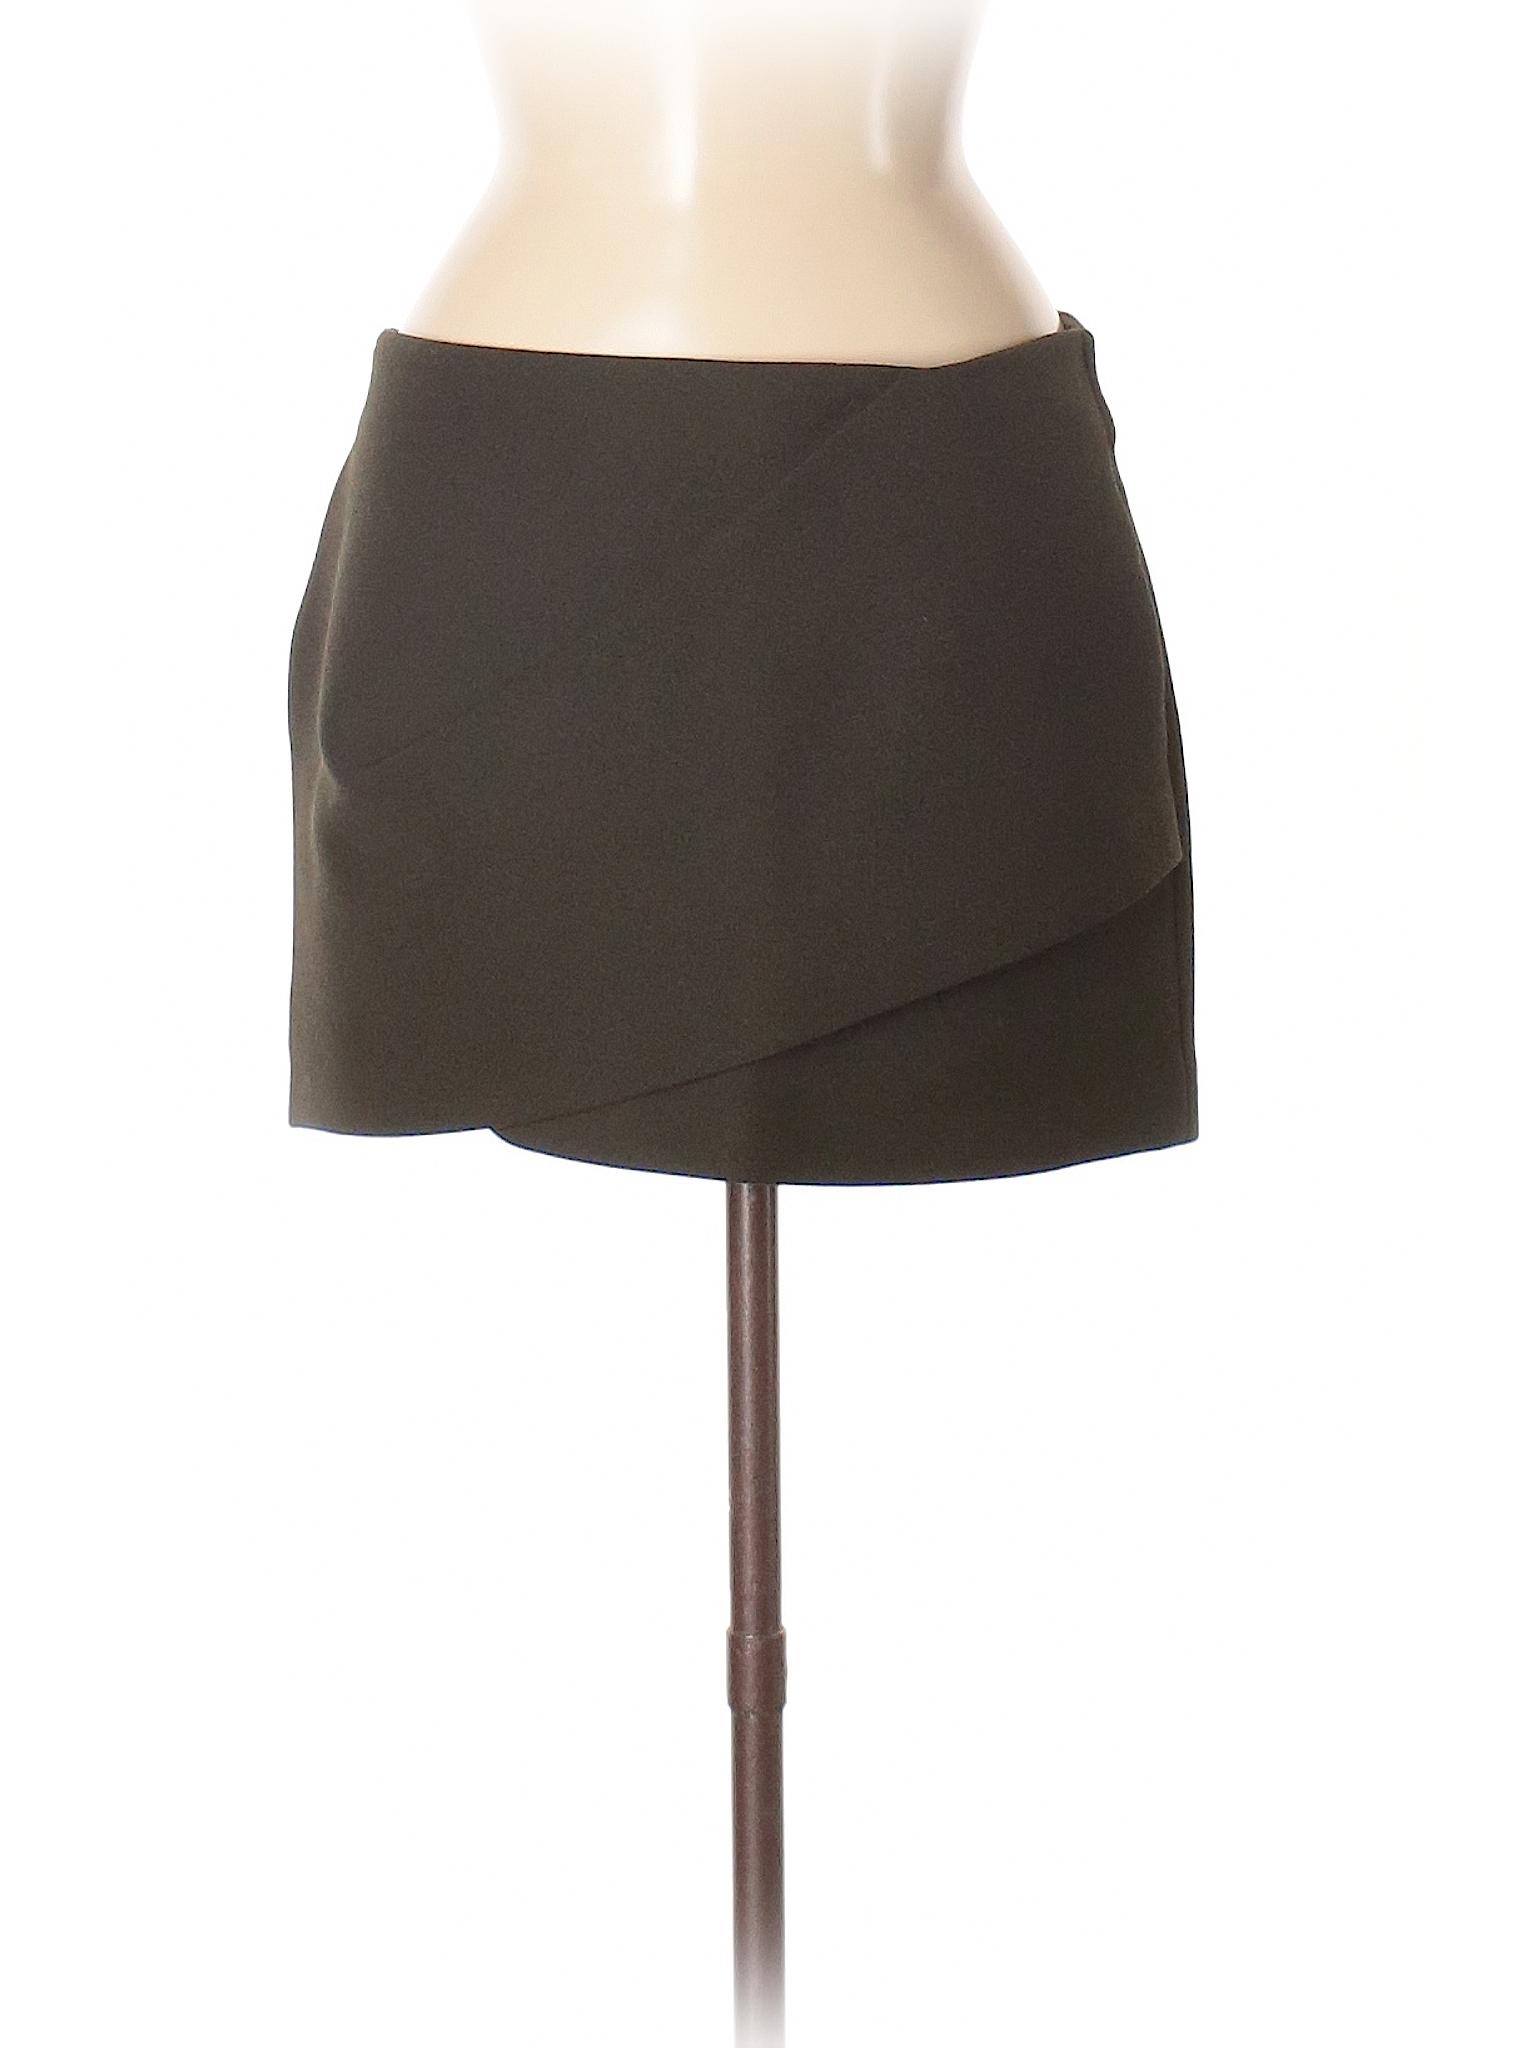 Skirt Boutique Skirt Casual Boutique Casual Boutique Casual Casual Skirt Boutique AWC6xFqCn